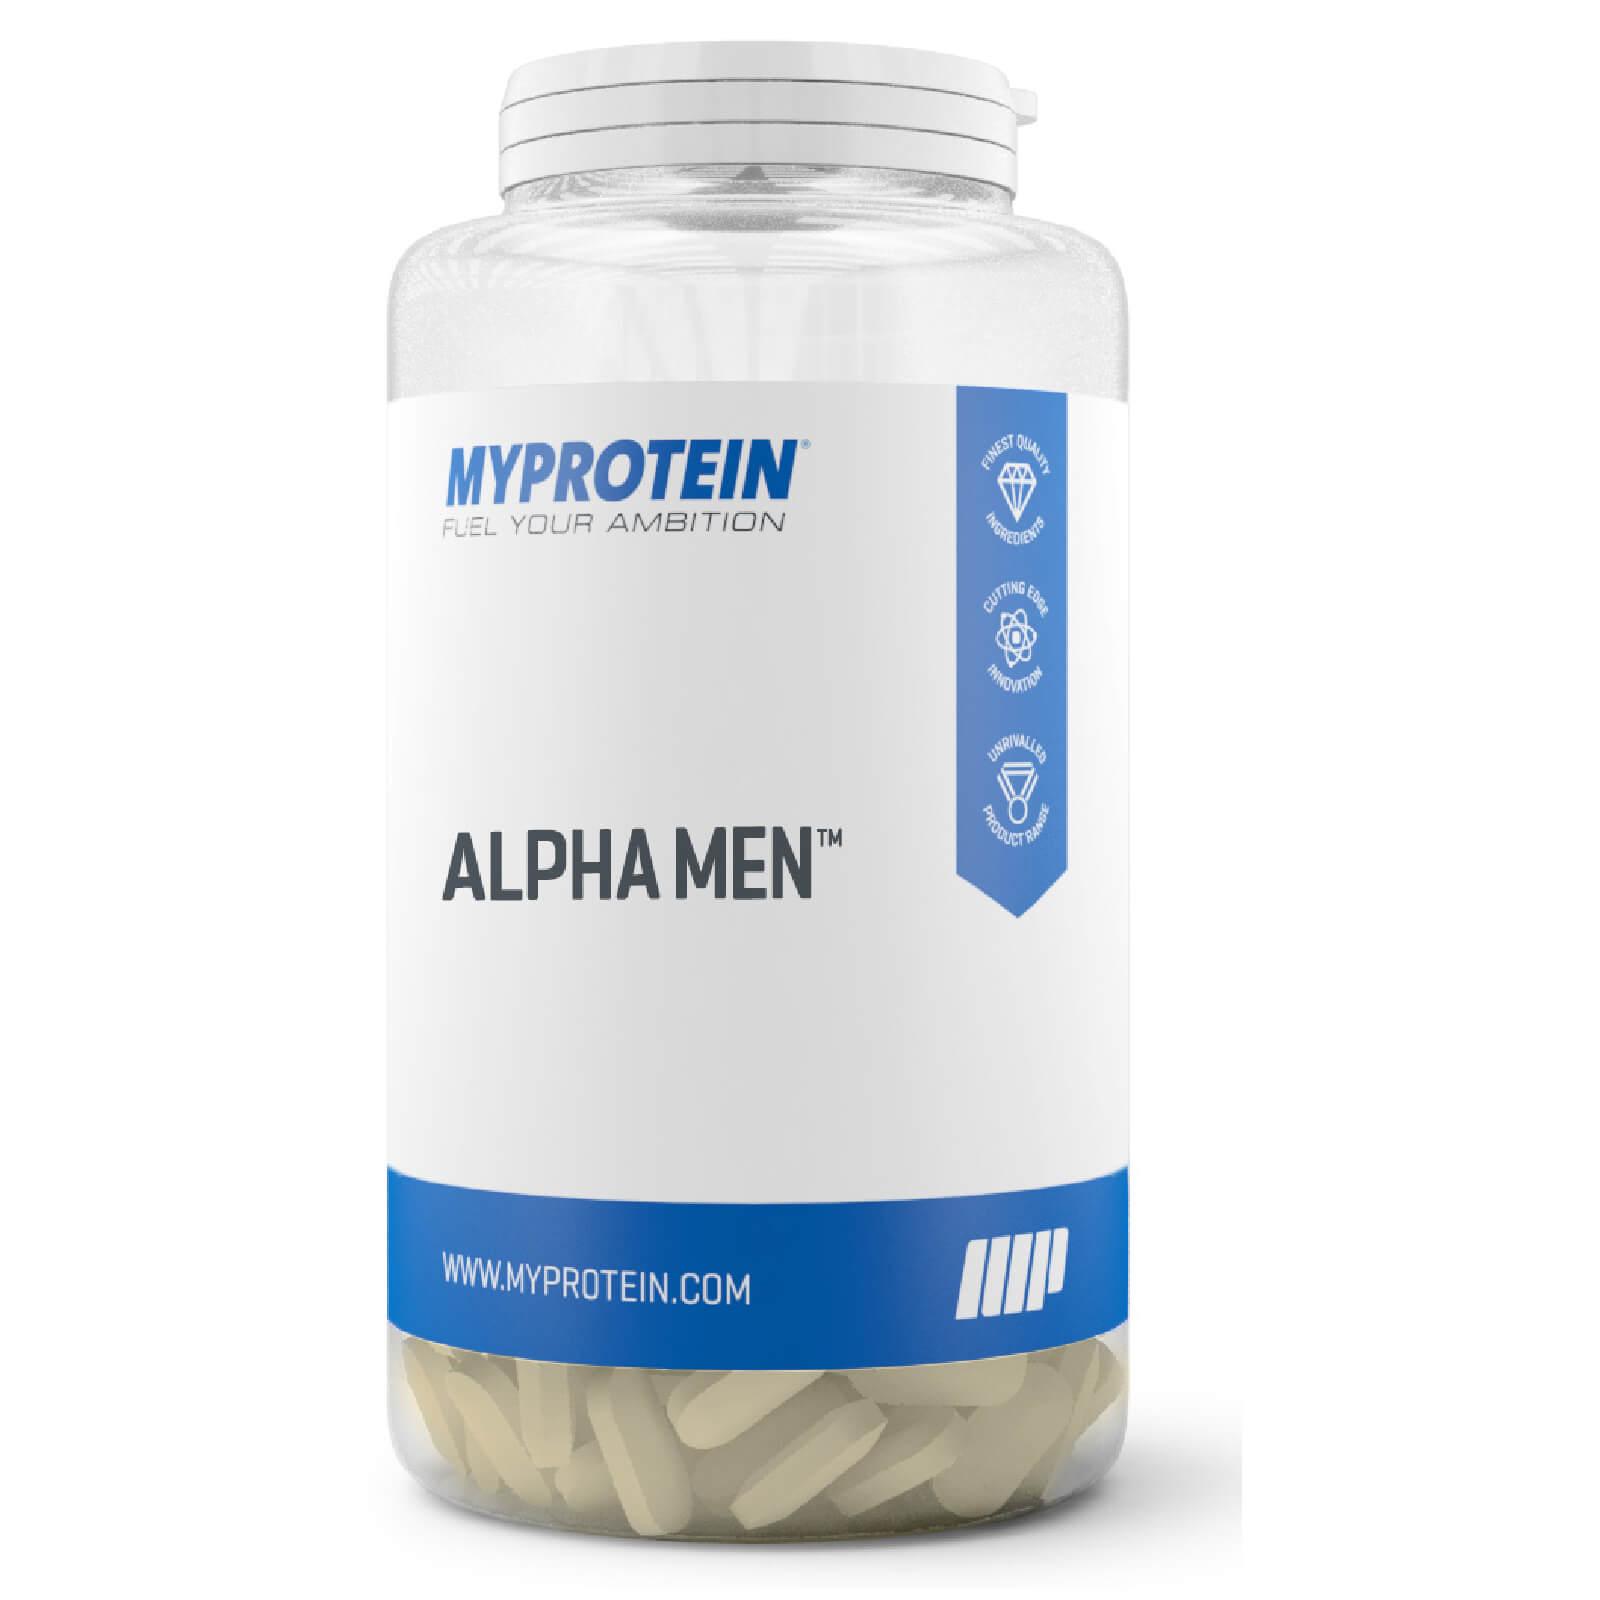 Alpha Men